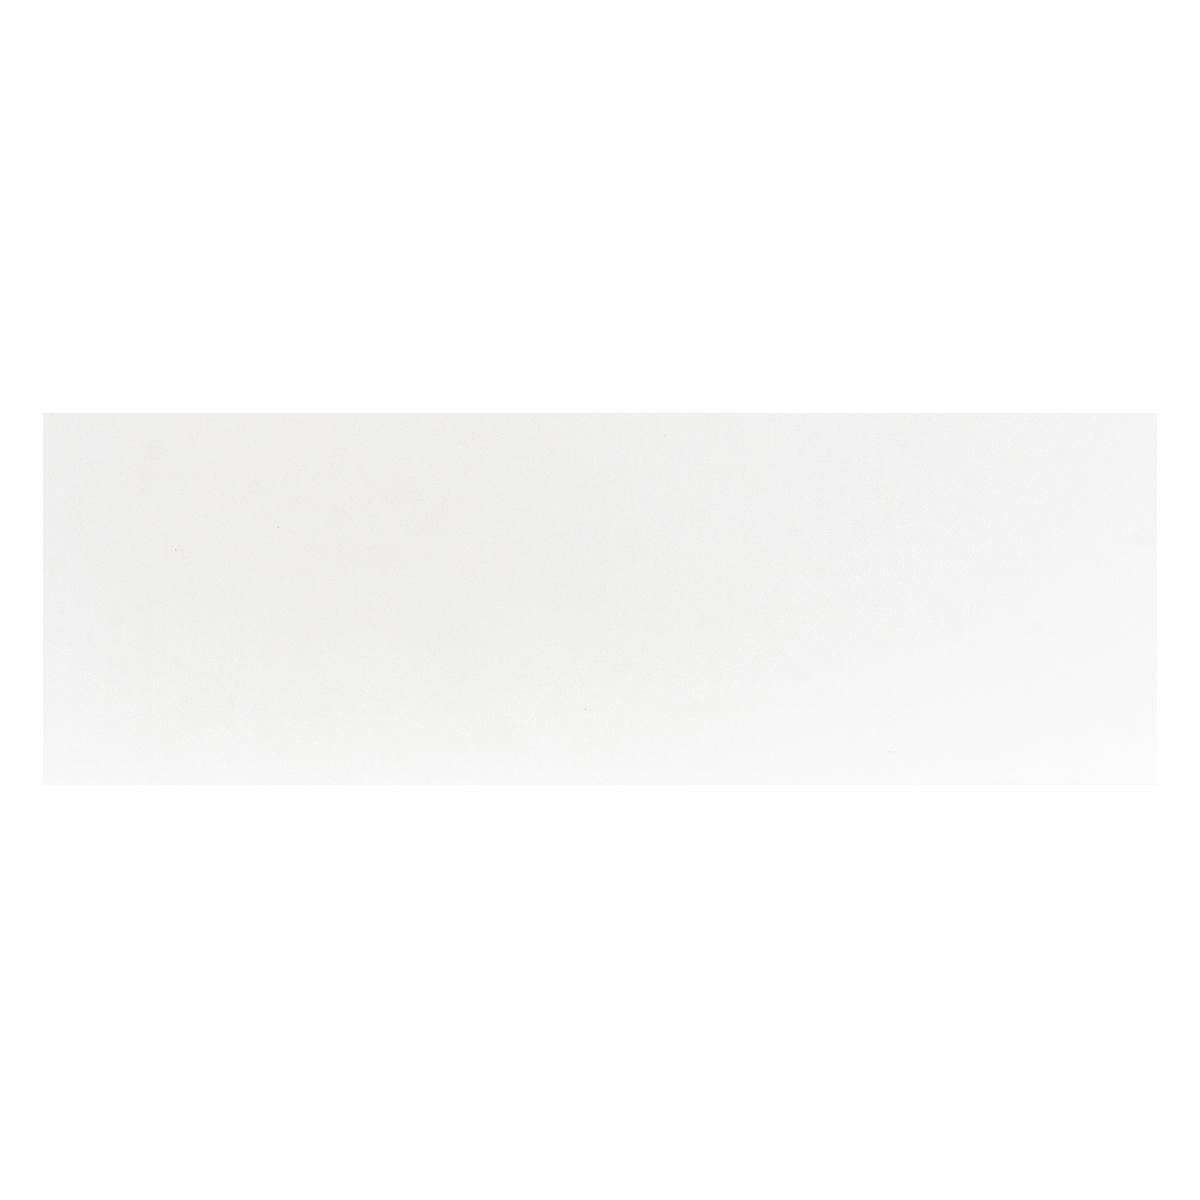 Mayólica Blanco Brillante - 30X90 cm - 1.62 m2